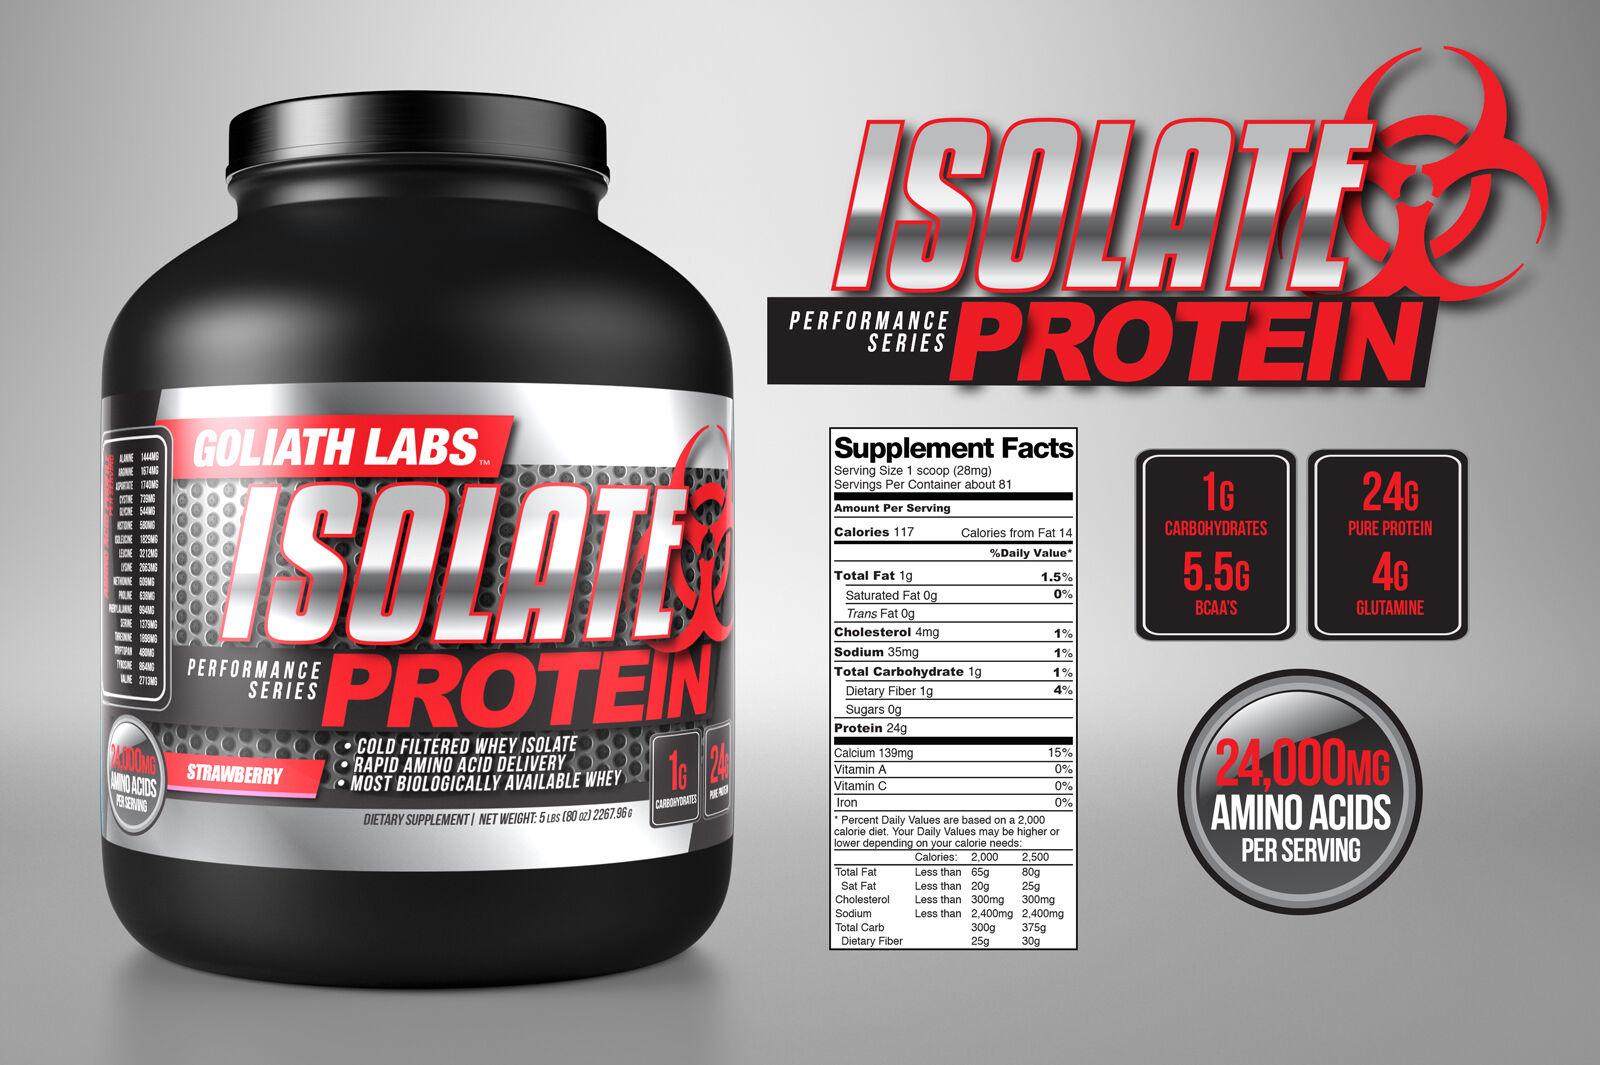 Goliath Labs 100% Isolate Whey Protein Powder 30lbs Isolate protein powder